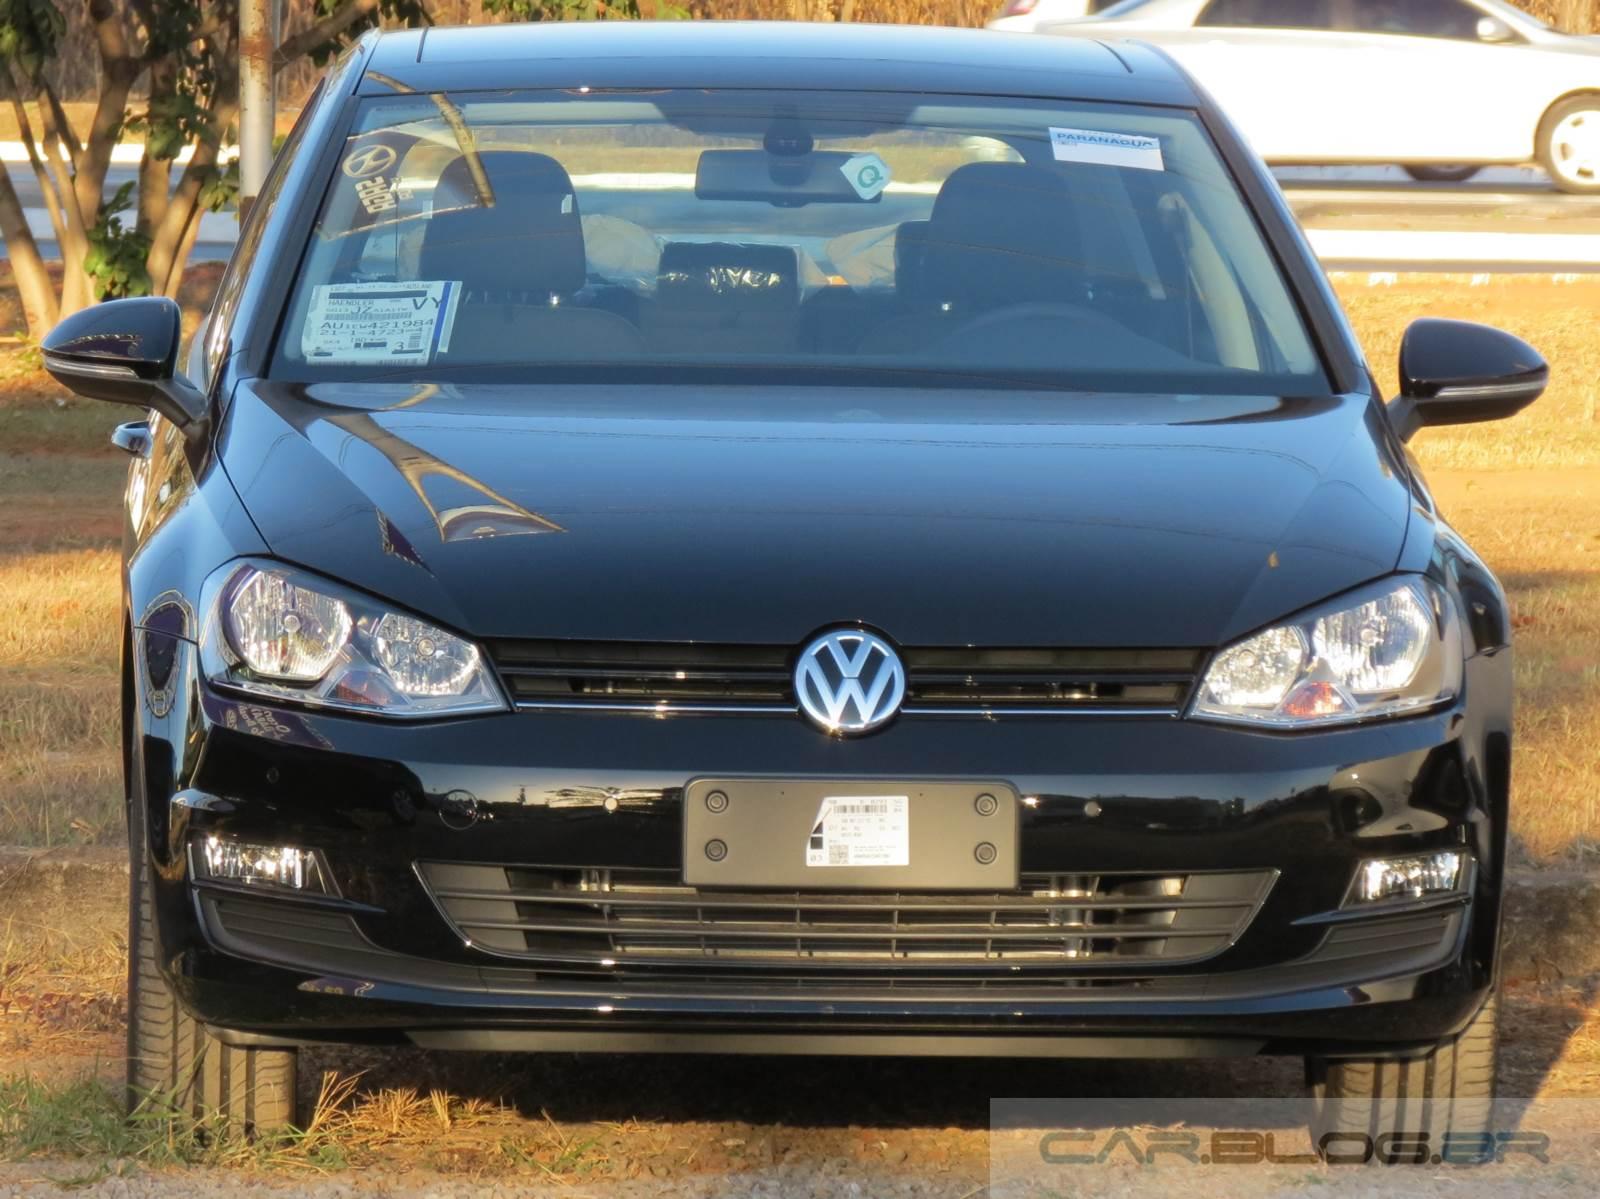 VW Golf Comfortline 1.4 TSI - Preço